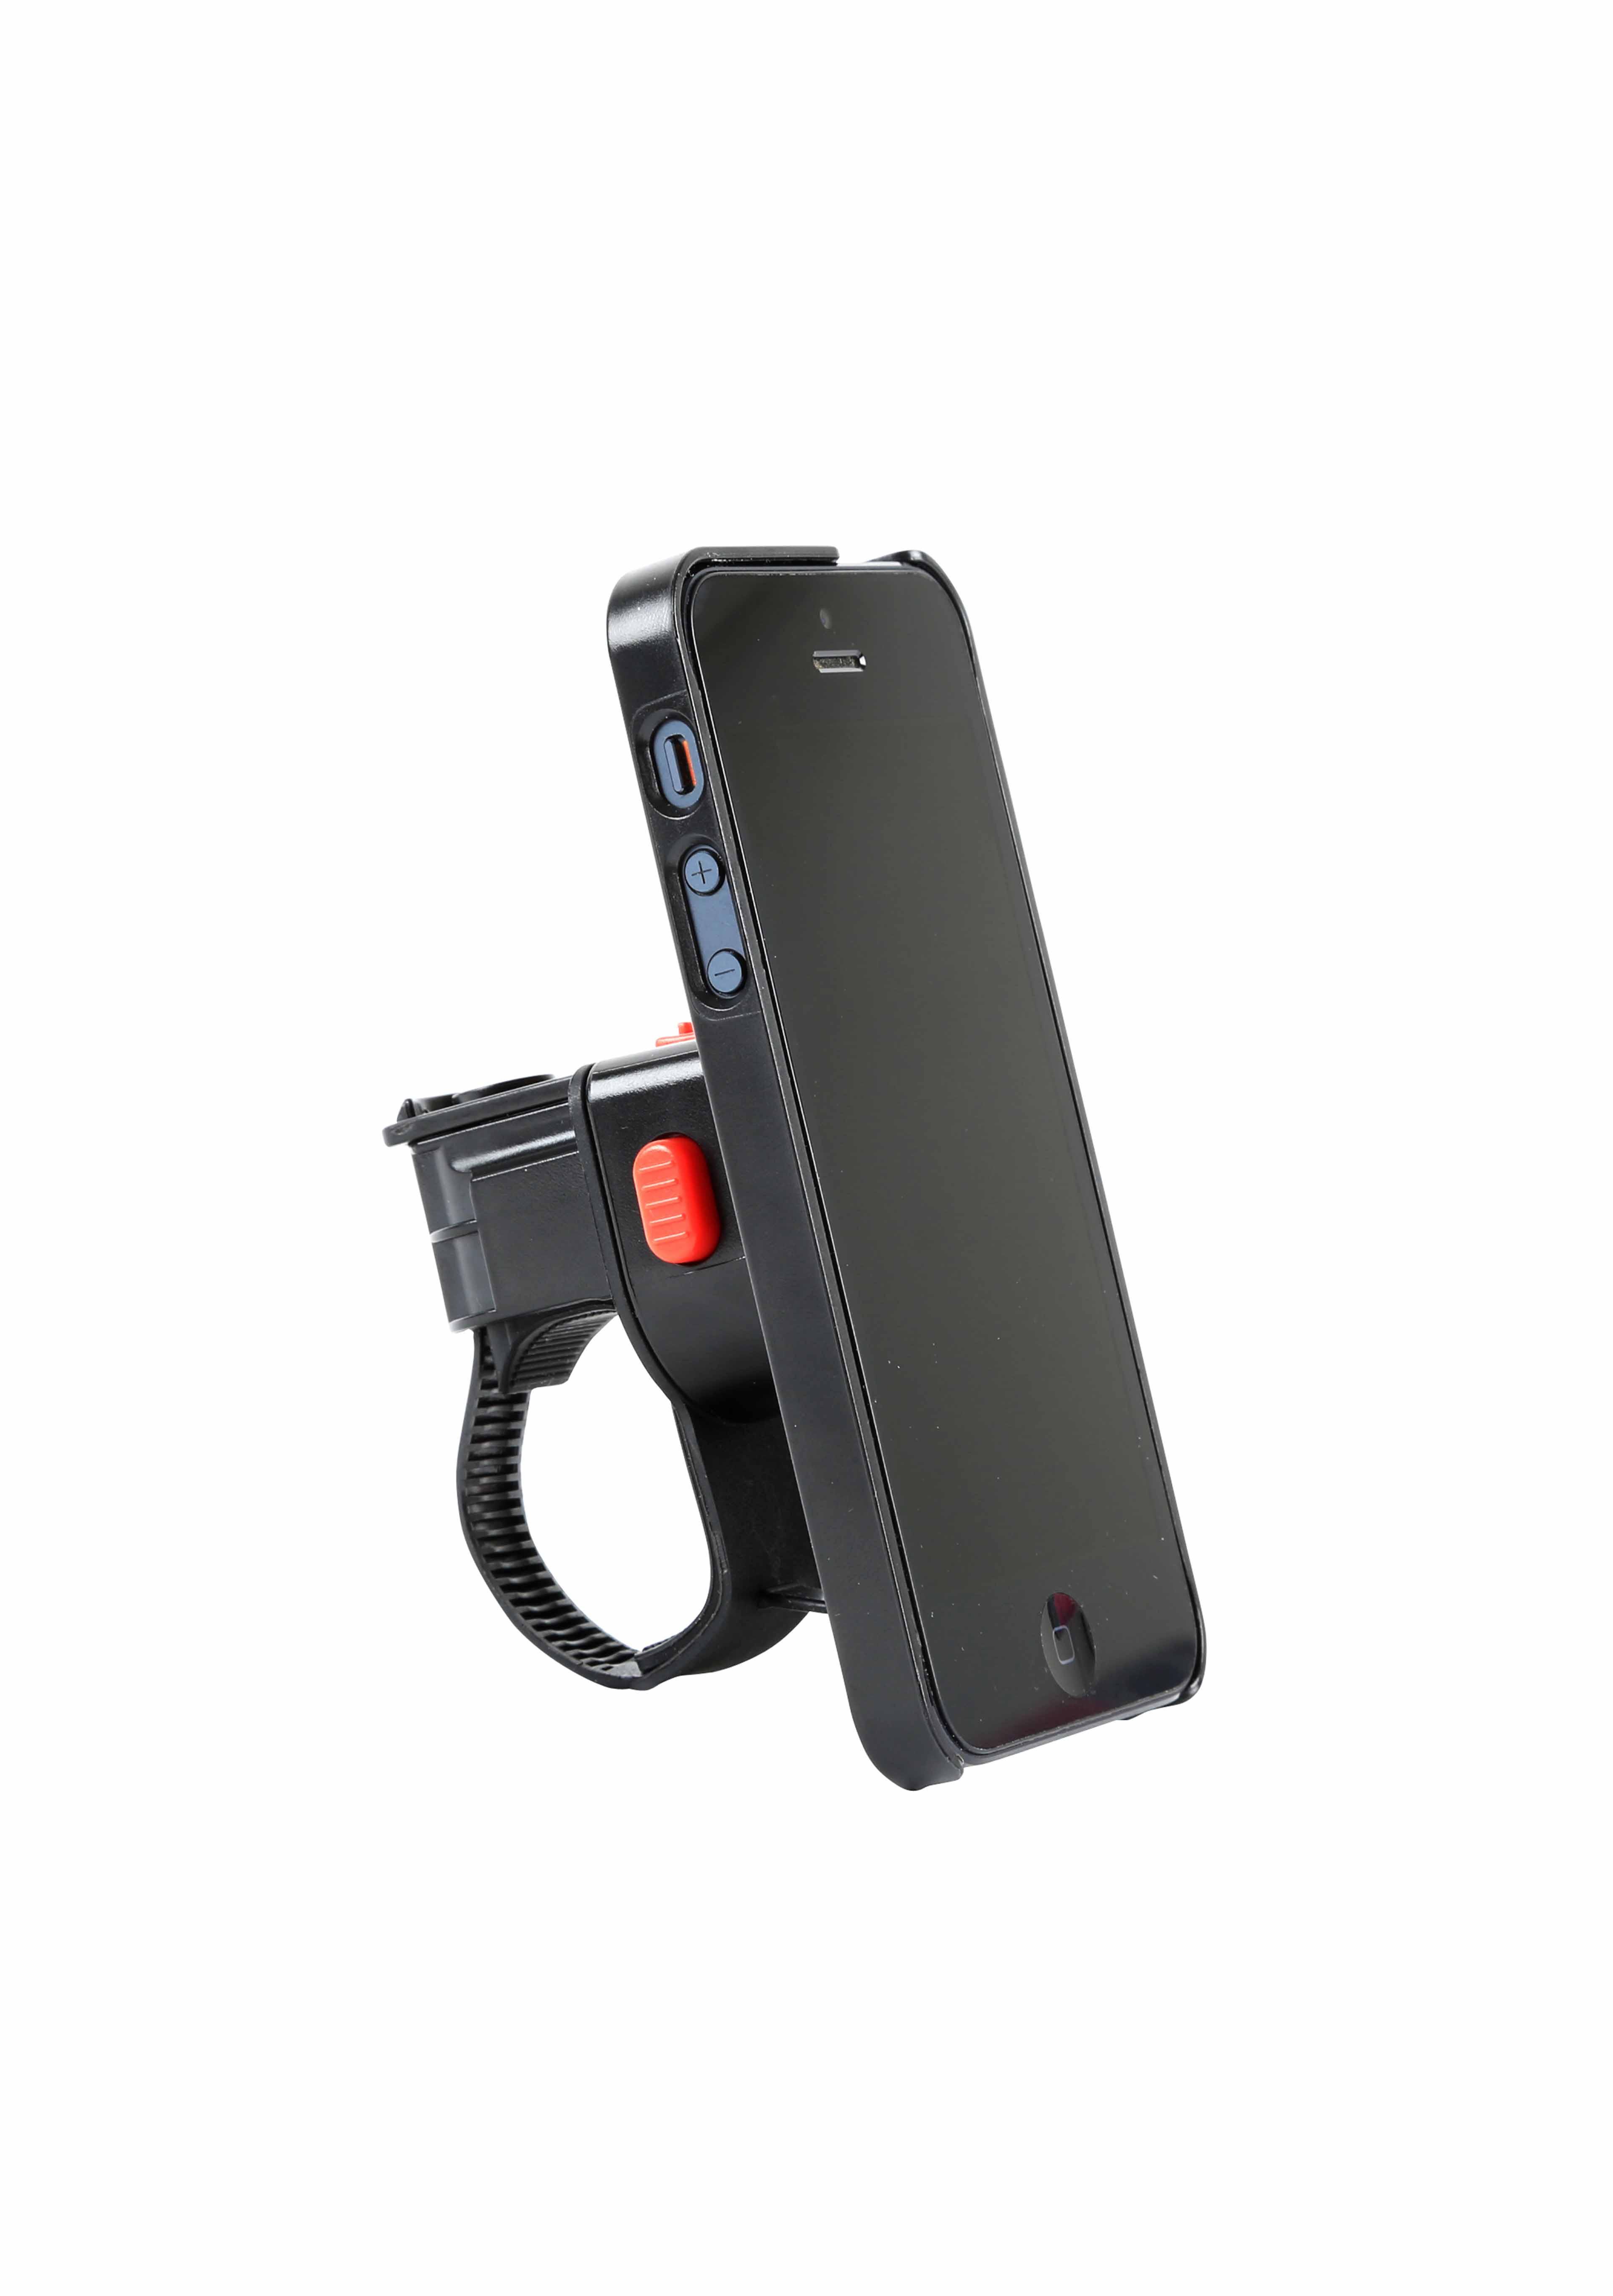 PORTACELLULARE Z CONSOLE LITE - PER iPHONE XR